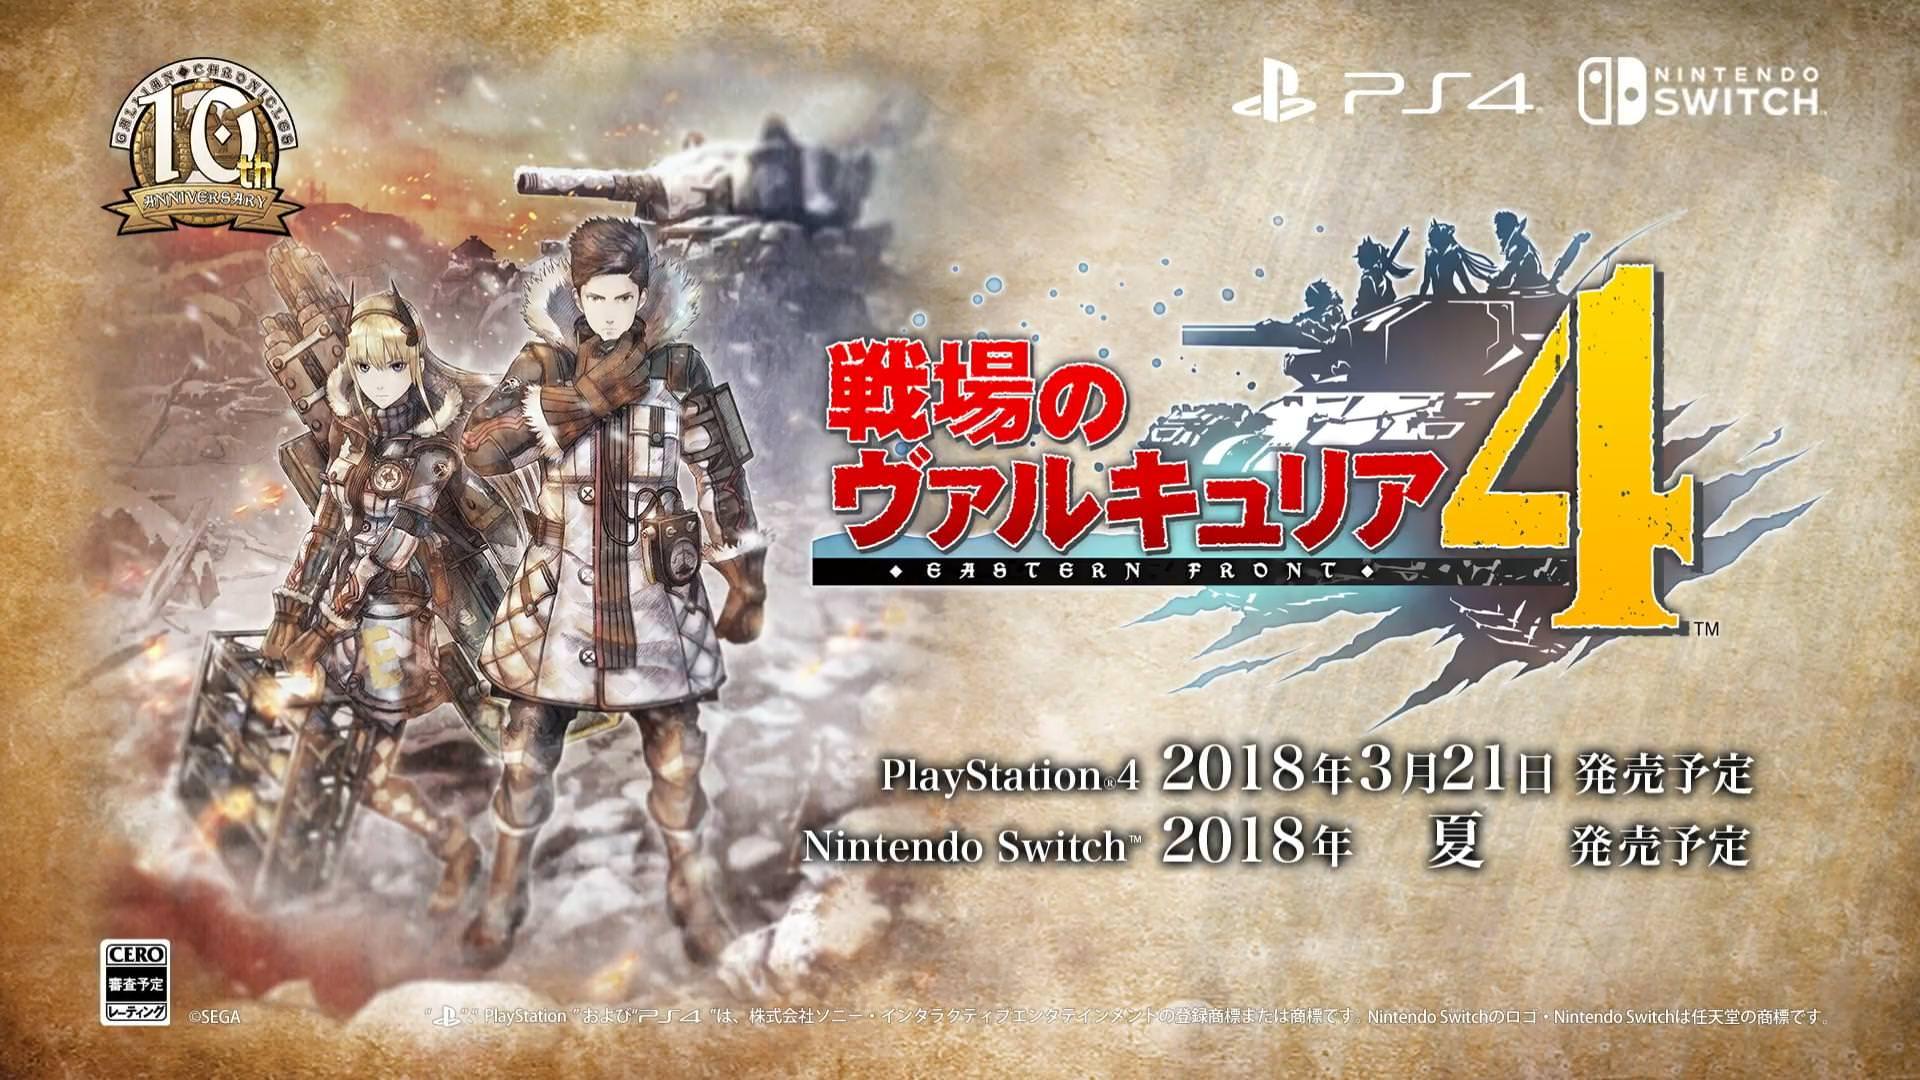 ZemfHLAV3kKvp - 戦場のヴァルキュリア4 PS4、スイッチ、xboxで2018年発売!!!